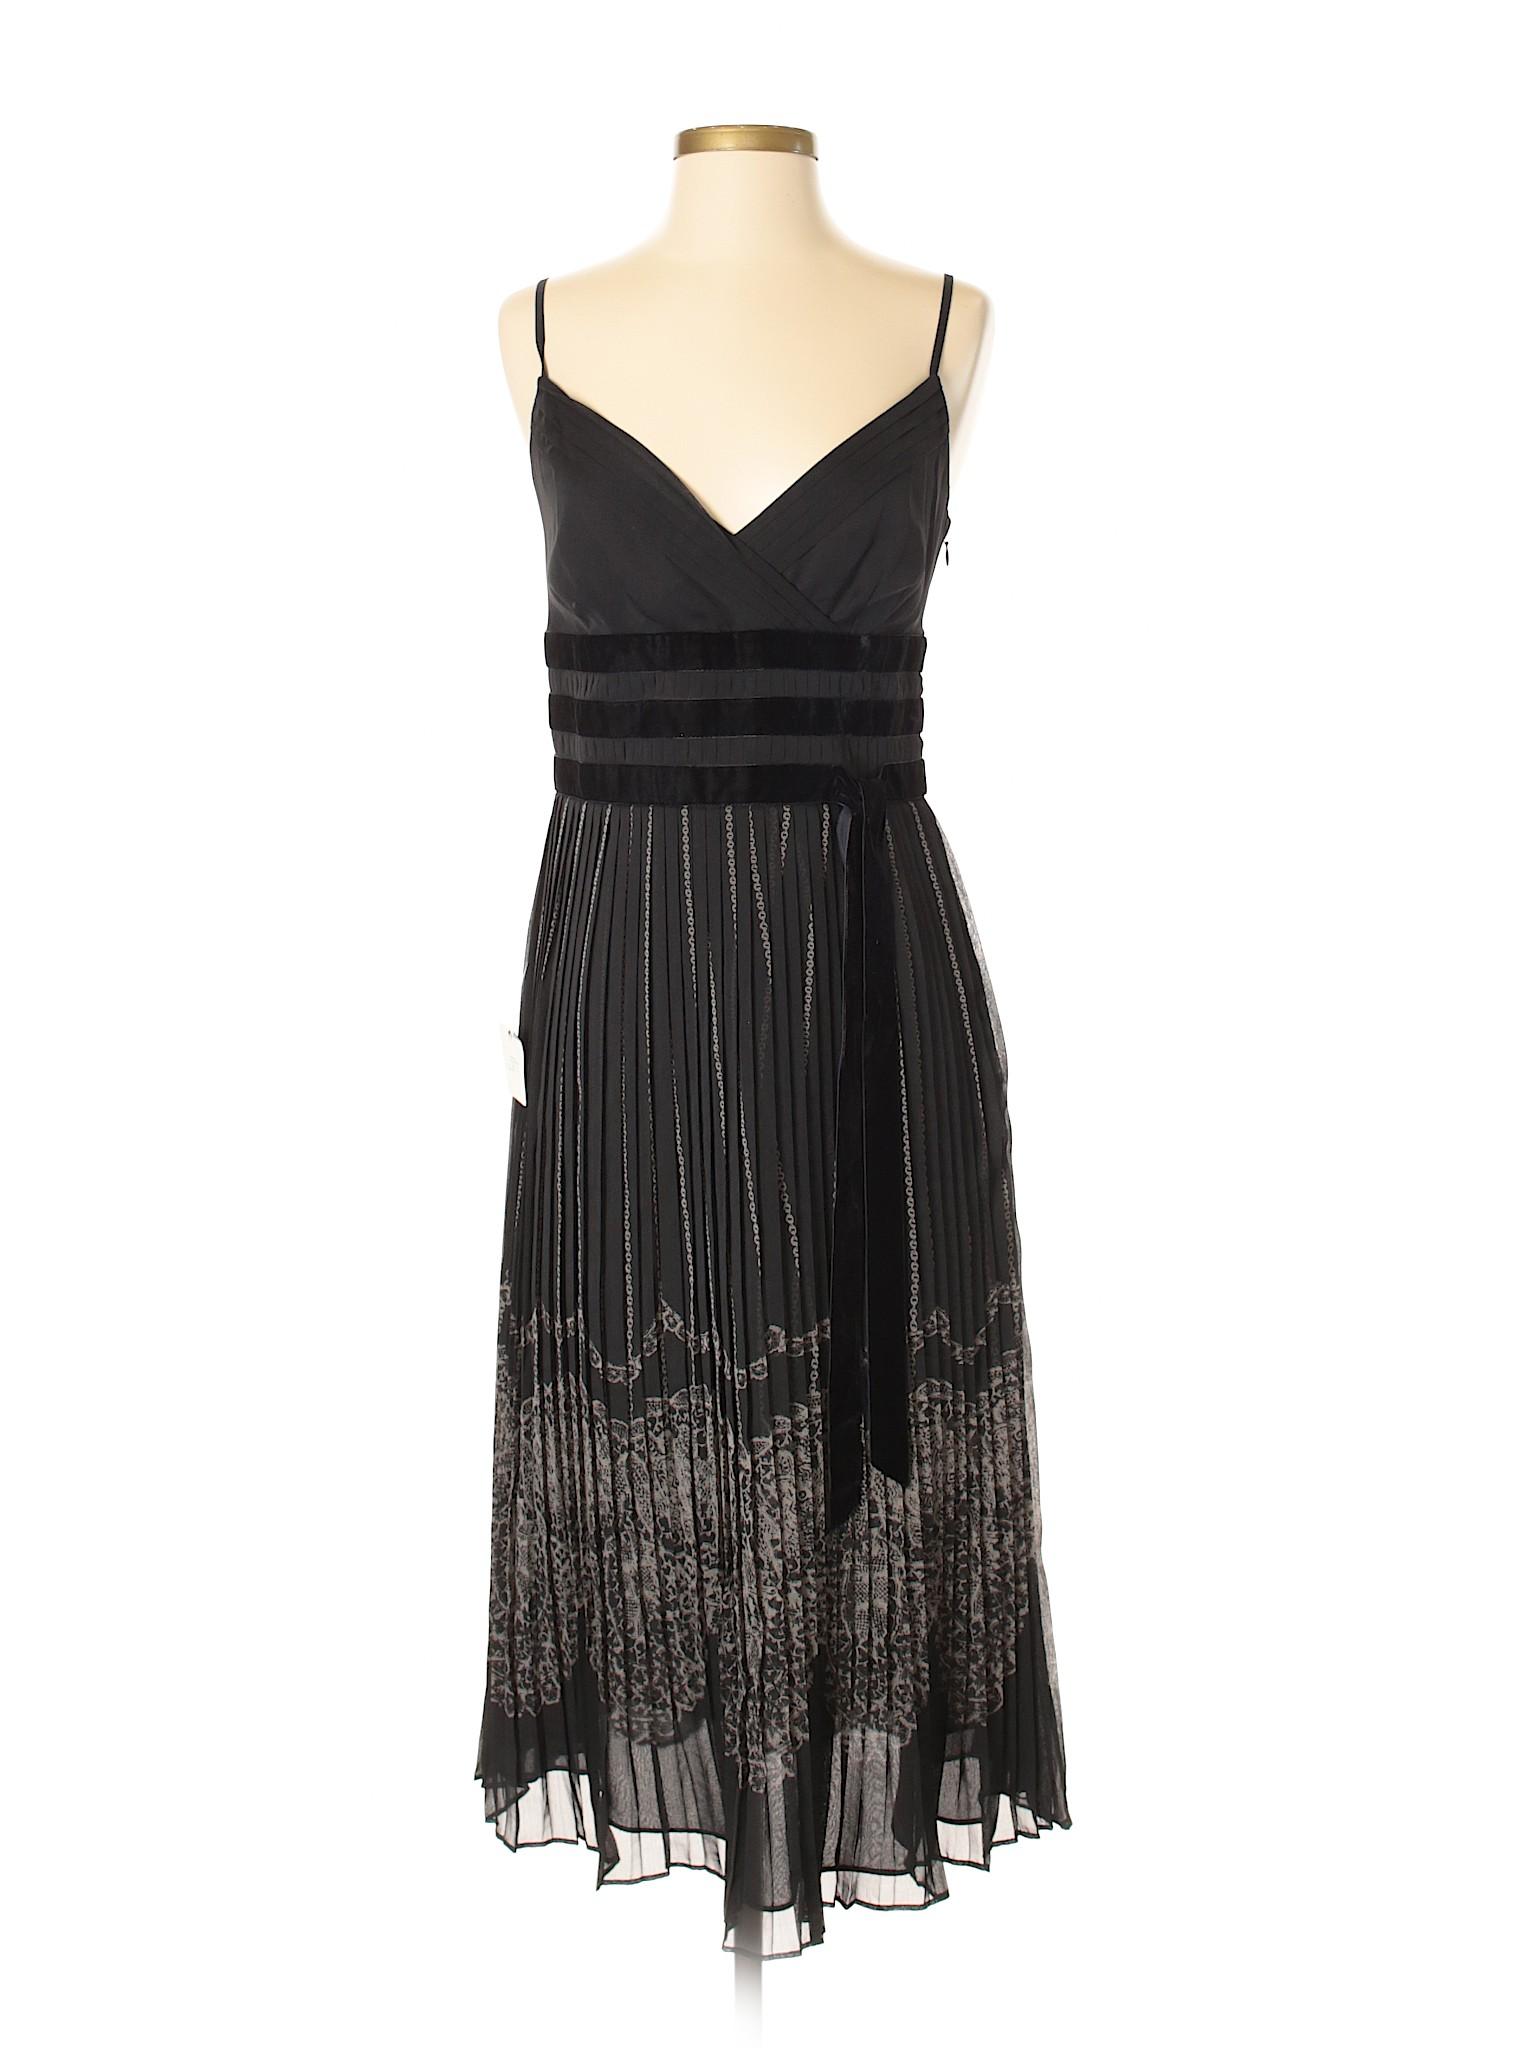 Dress Casual LOFT Taylor Boutique Ann winter q1wXn0